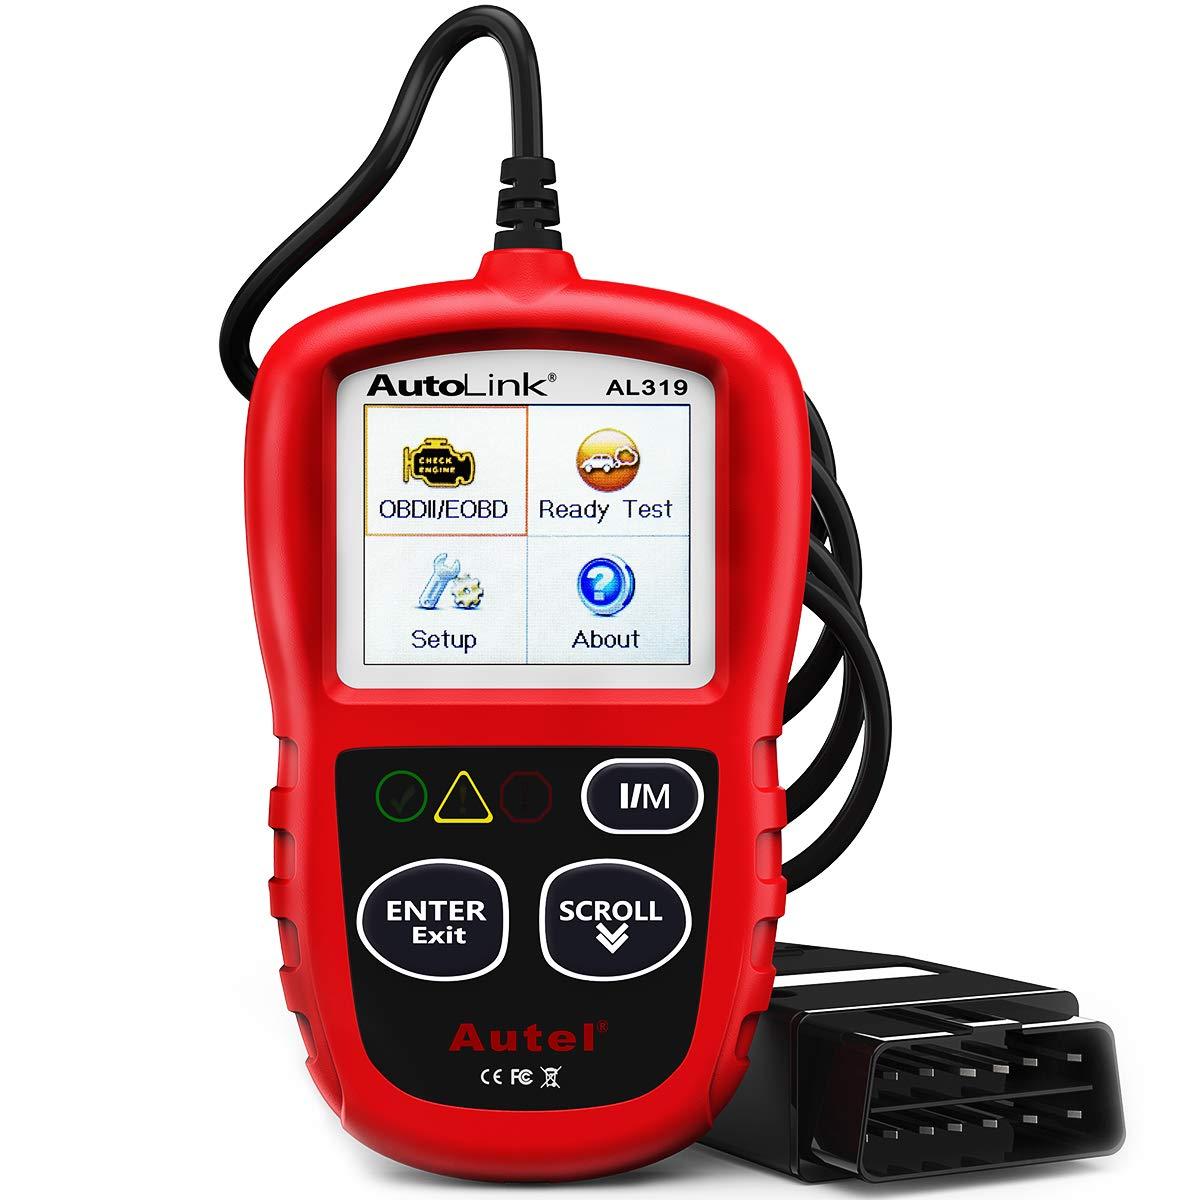 Autel AutoLink AL319 OBD2 Scanner (Review & Buying Guide 2019)